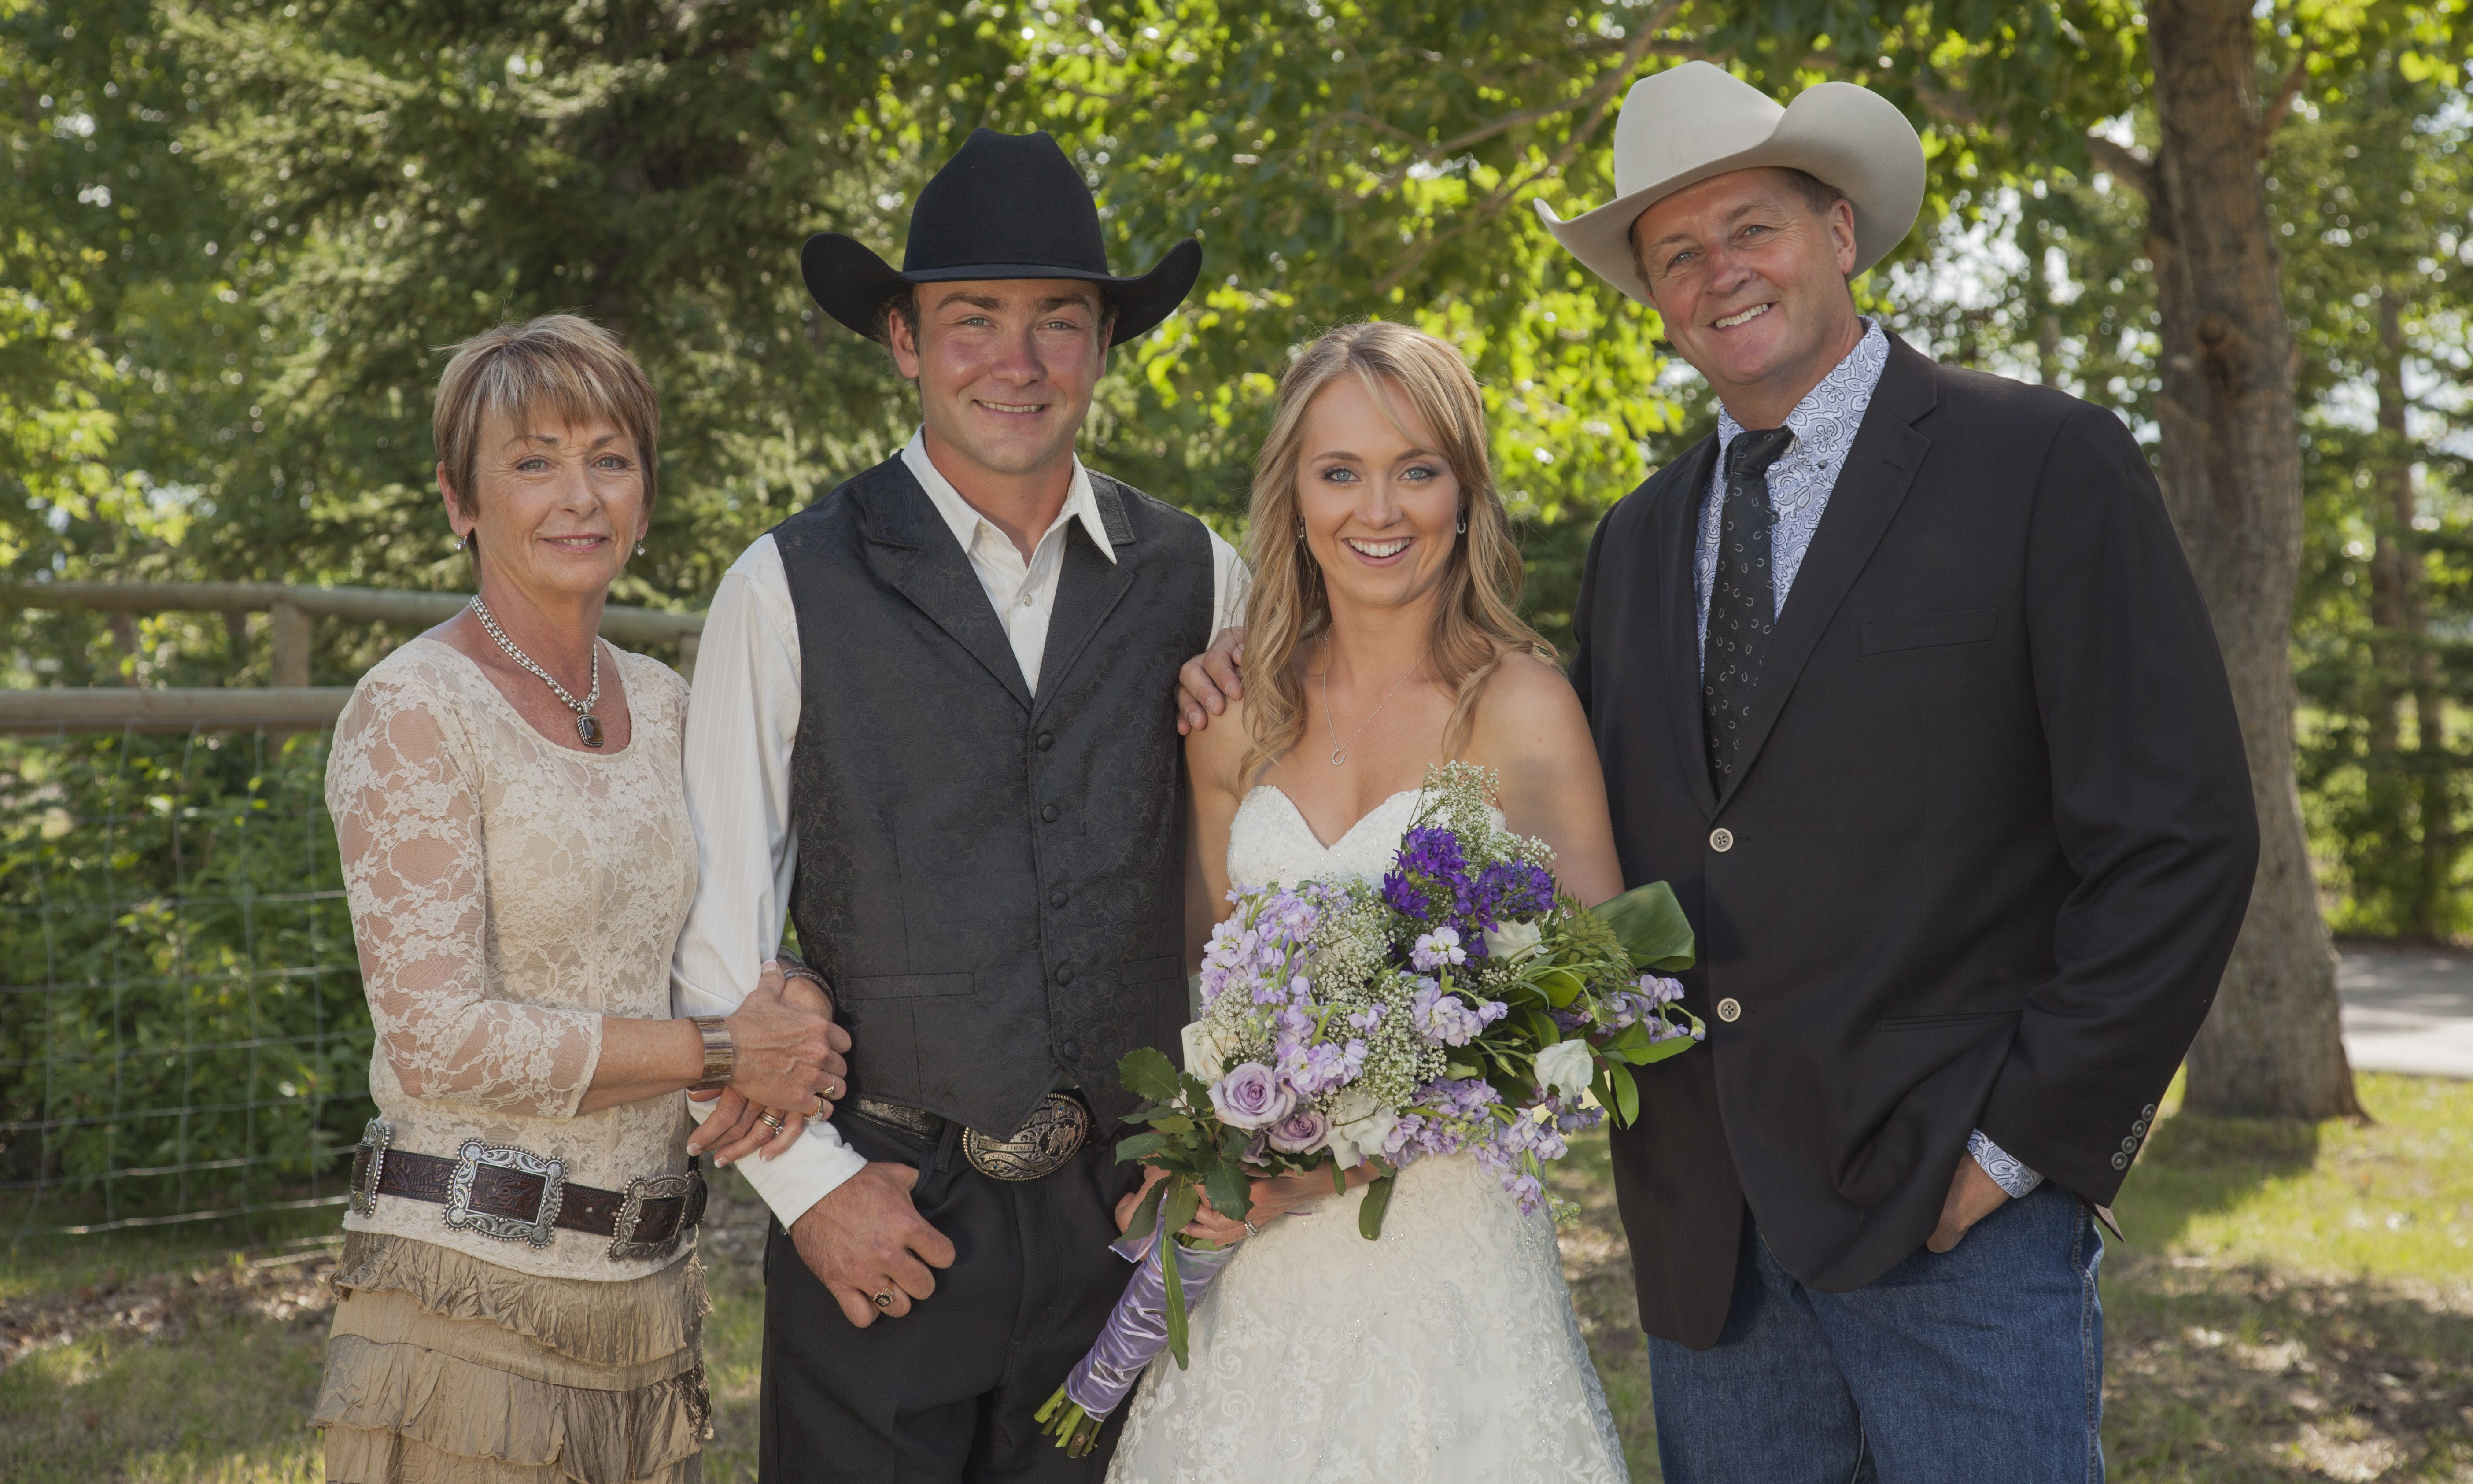 Amber Marshall Wedding.Heartland Actress Amber Marshall S Rustic Ranch Wedding